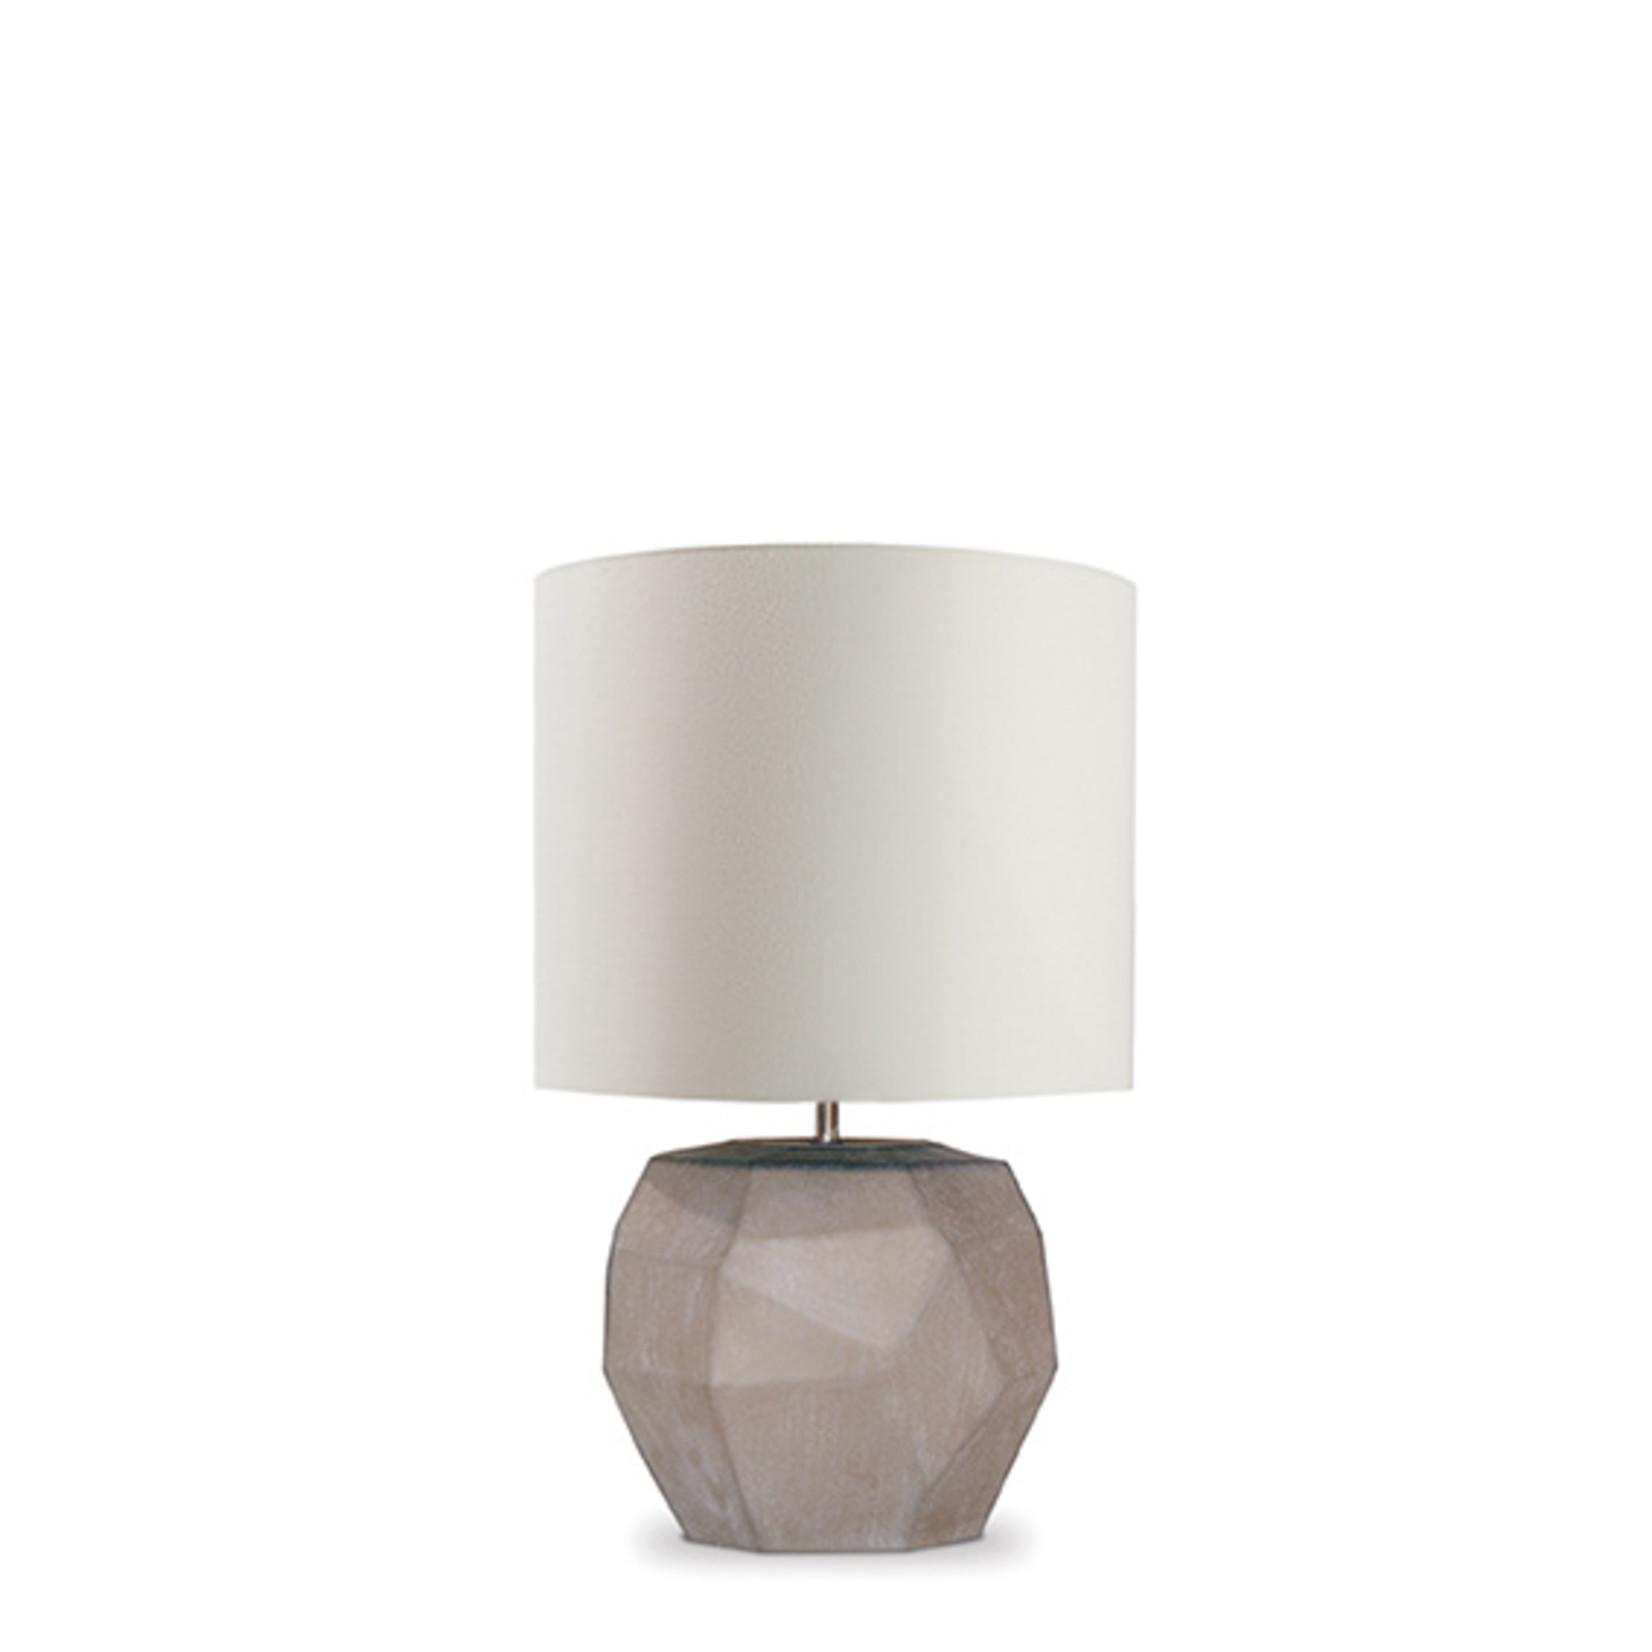 Guaxs Tafellamp Cubistic Round | Smokegrey